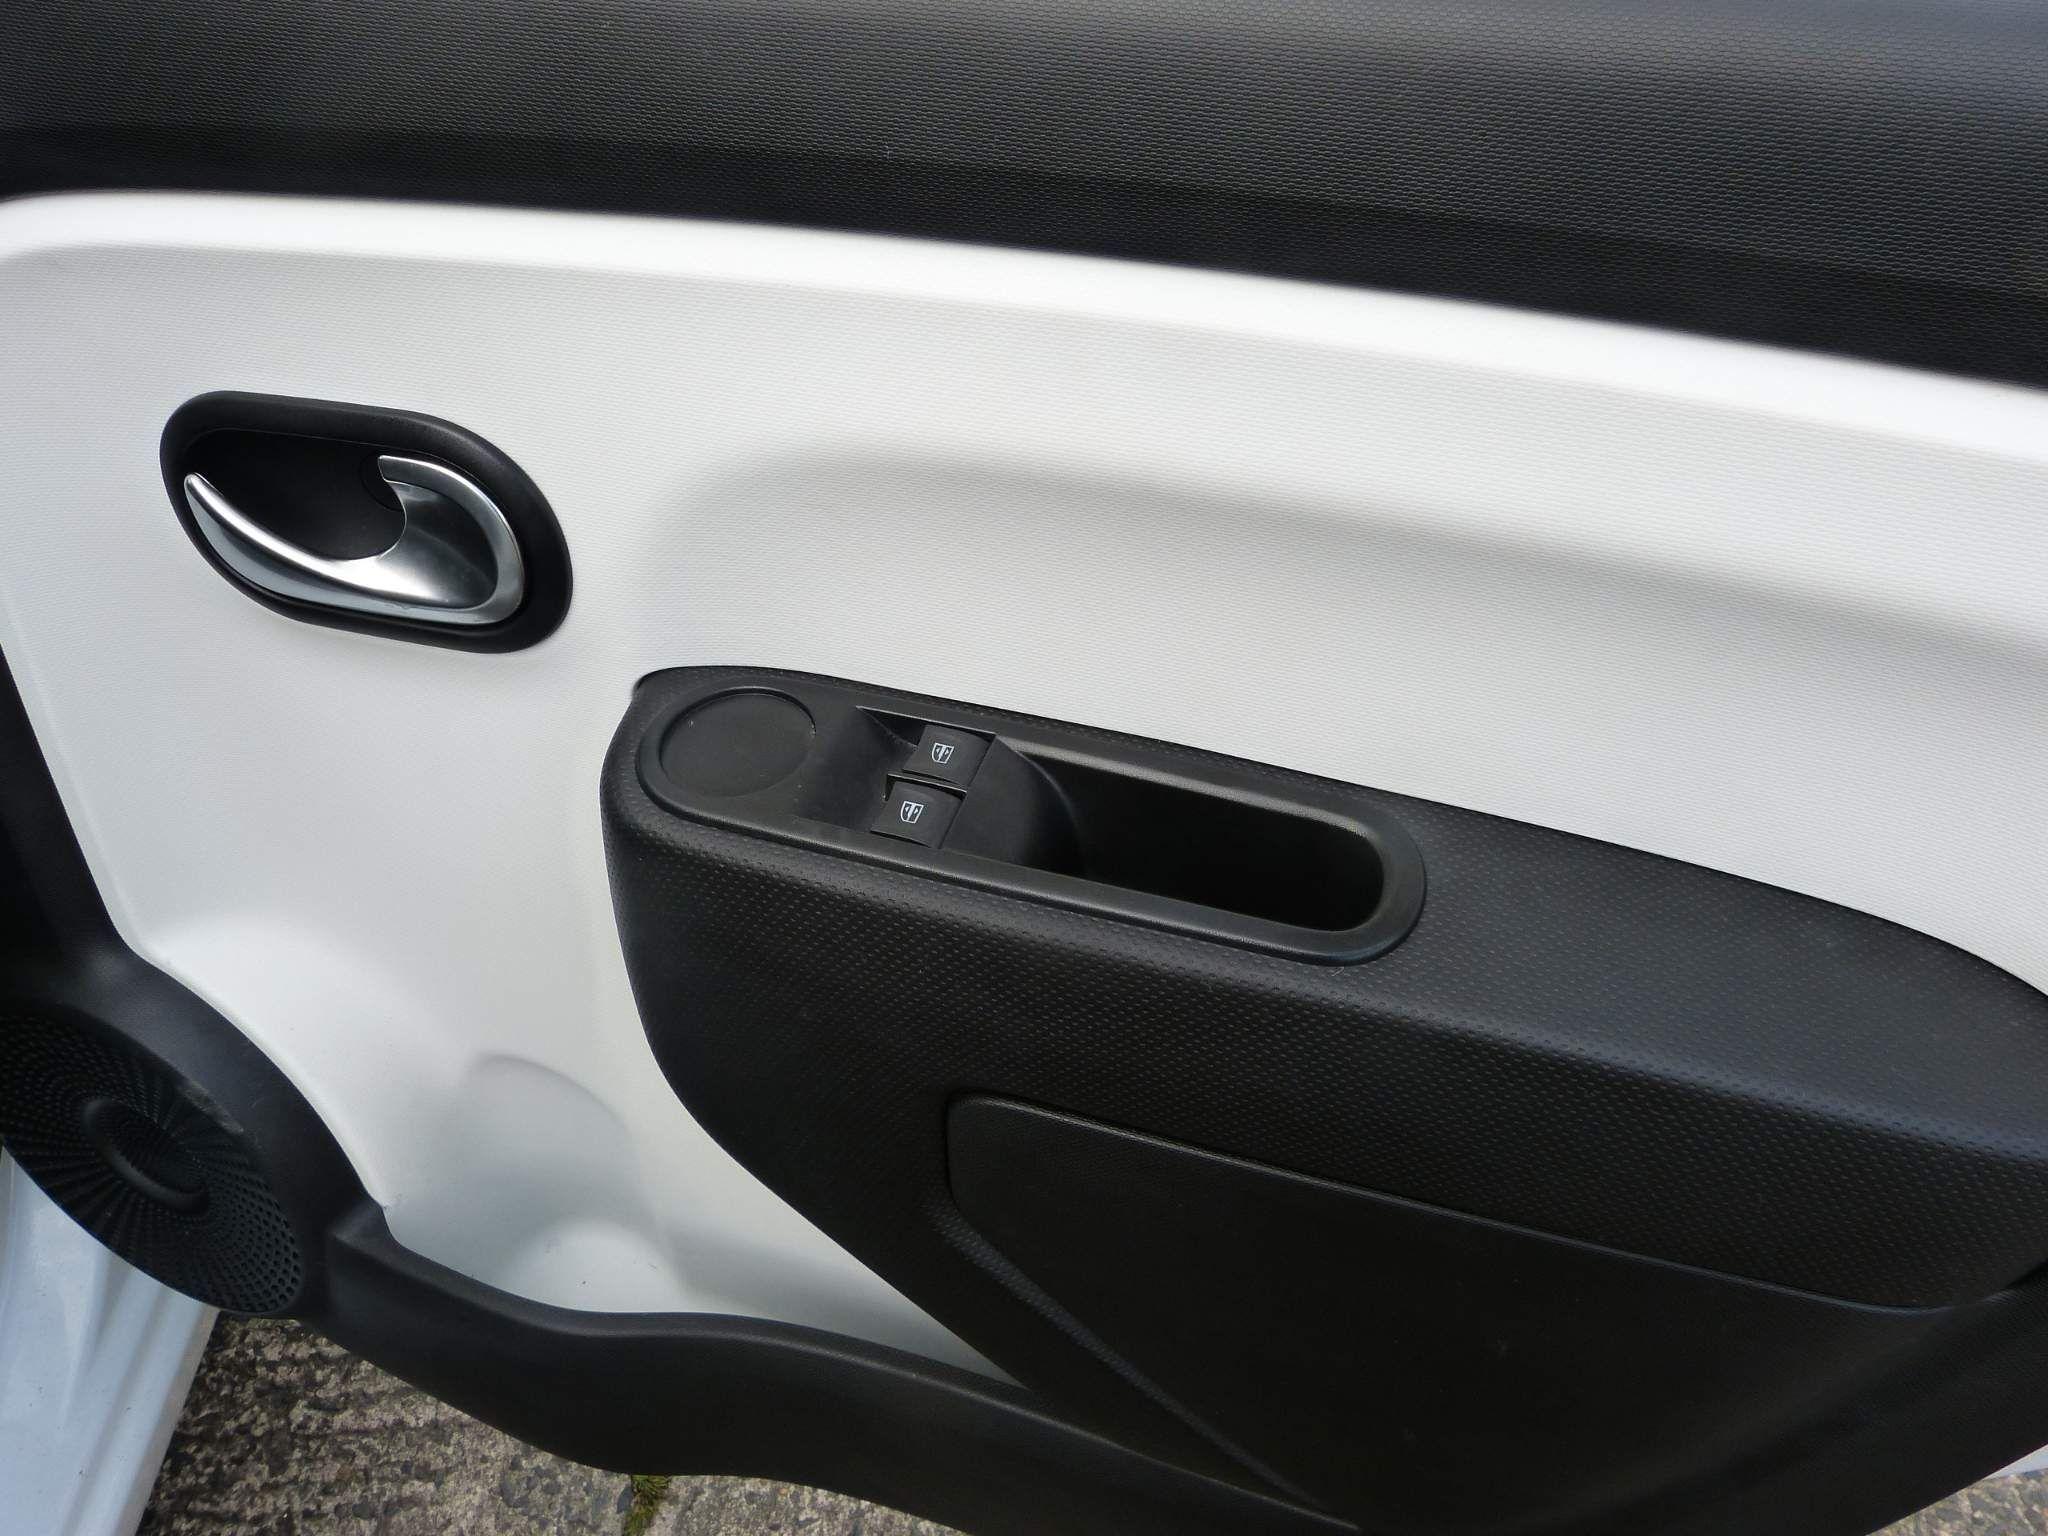 2018 RENAULT Twingo 1.0 SCe Play Petrol Manual  – Beechlawn Motors Belfast full